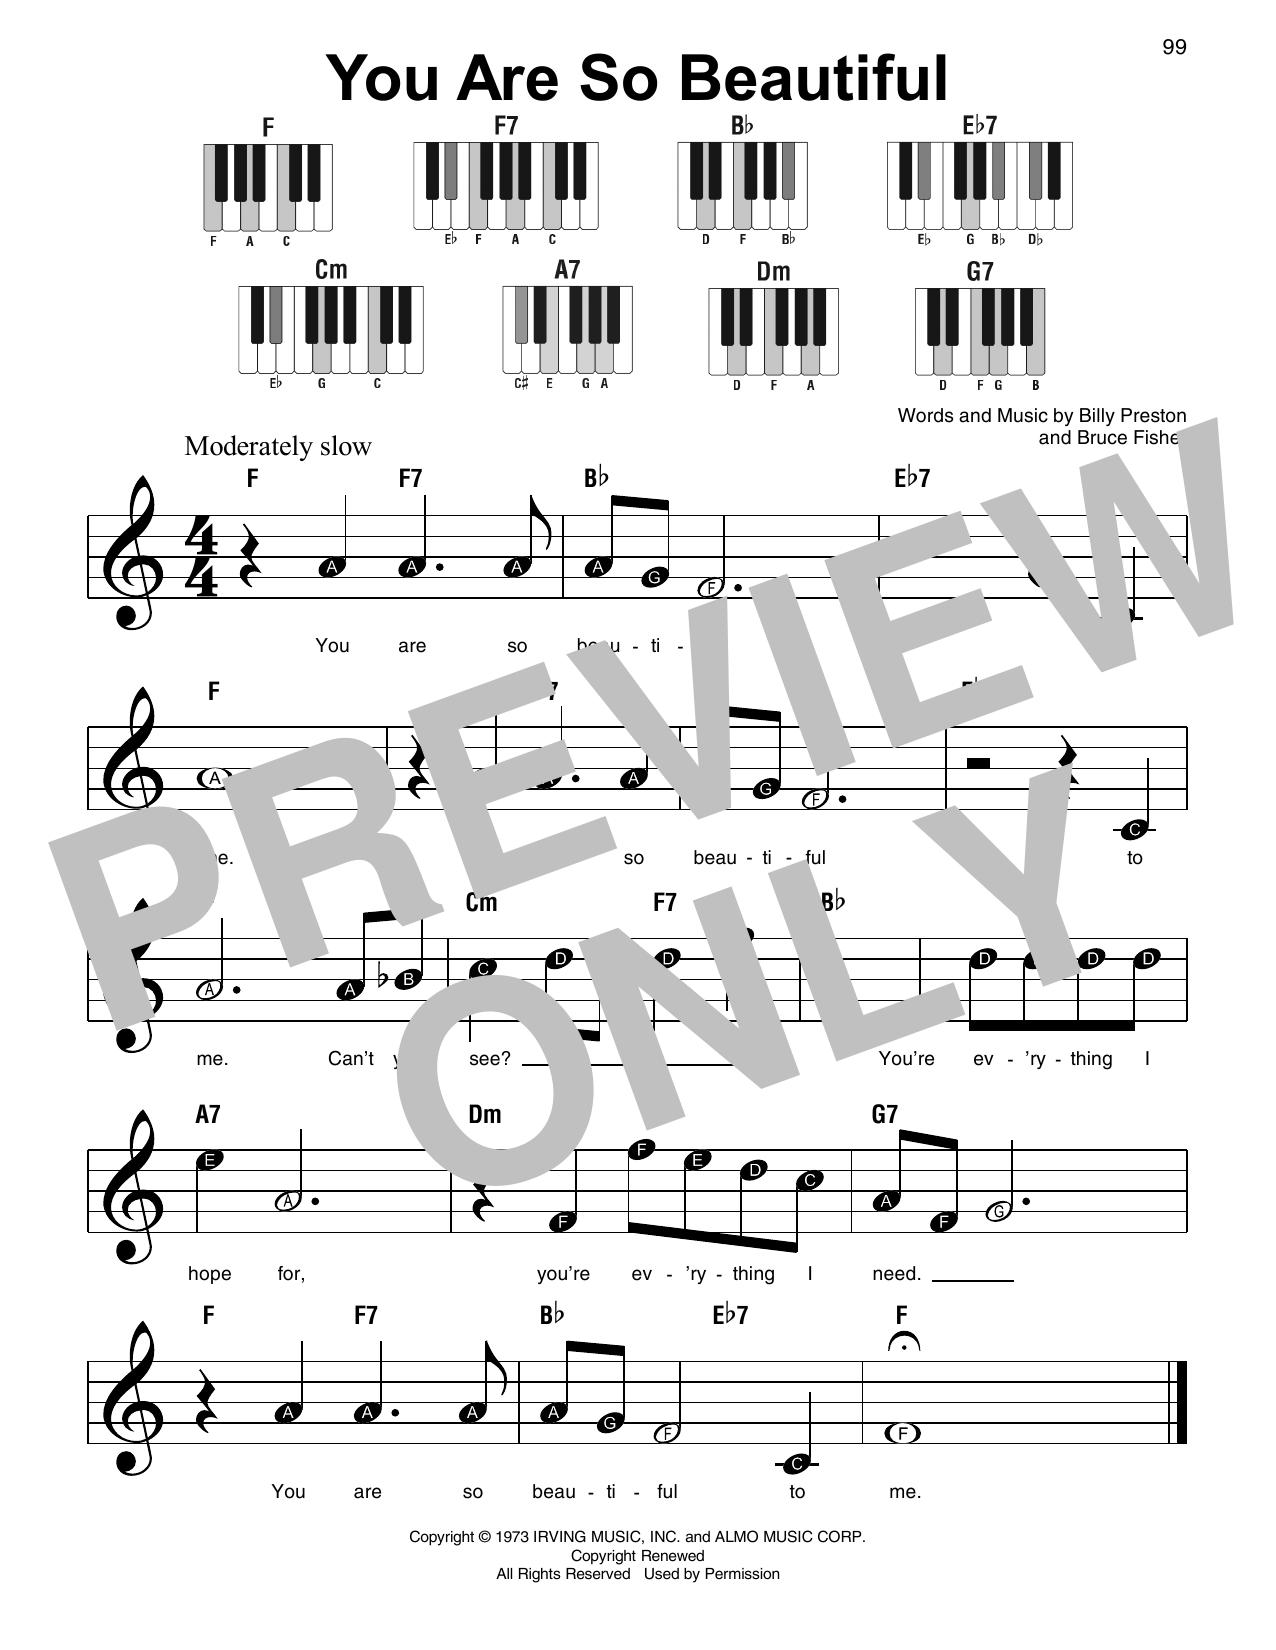 You Are So Beautiful Sheet Music